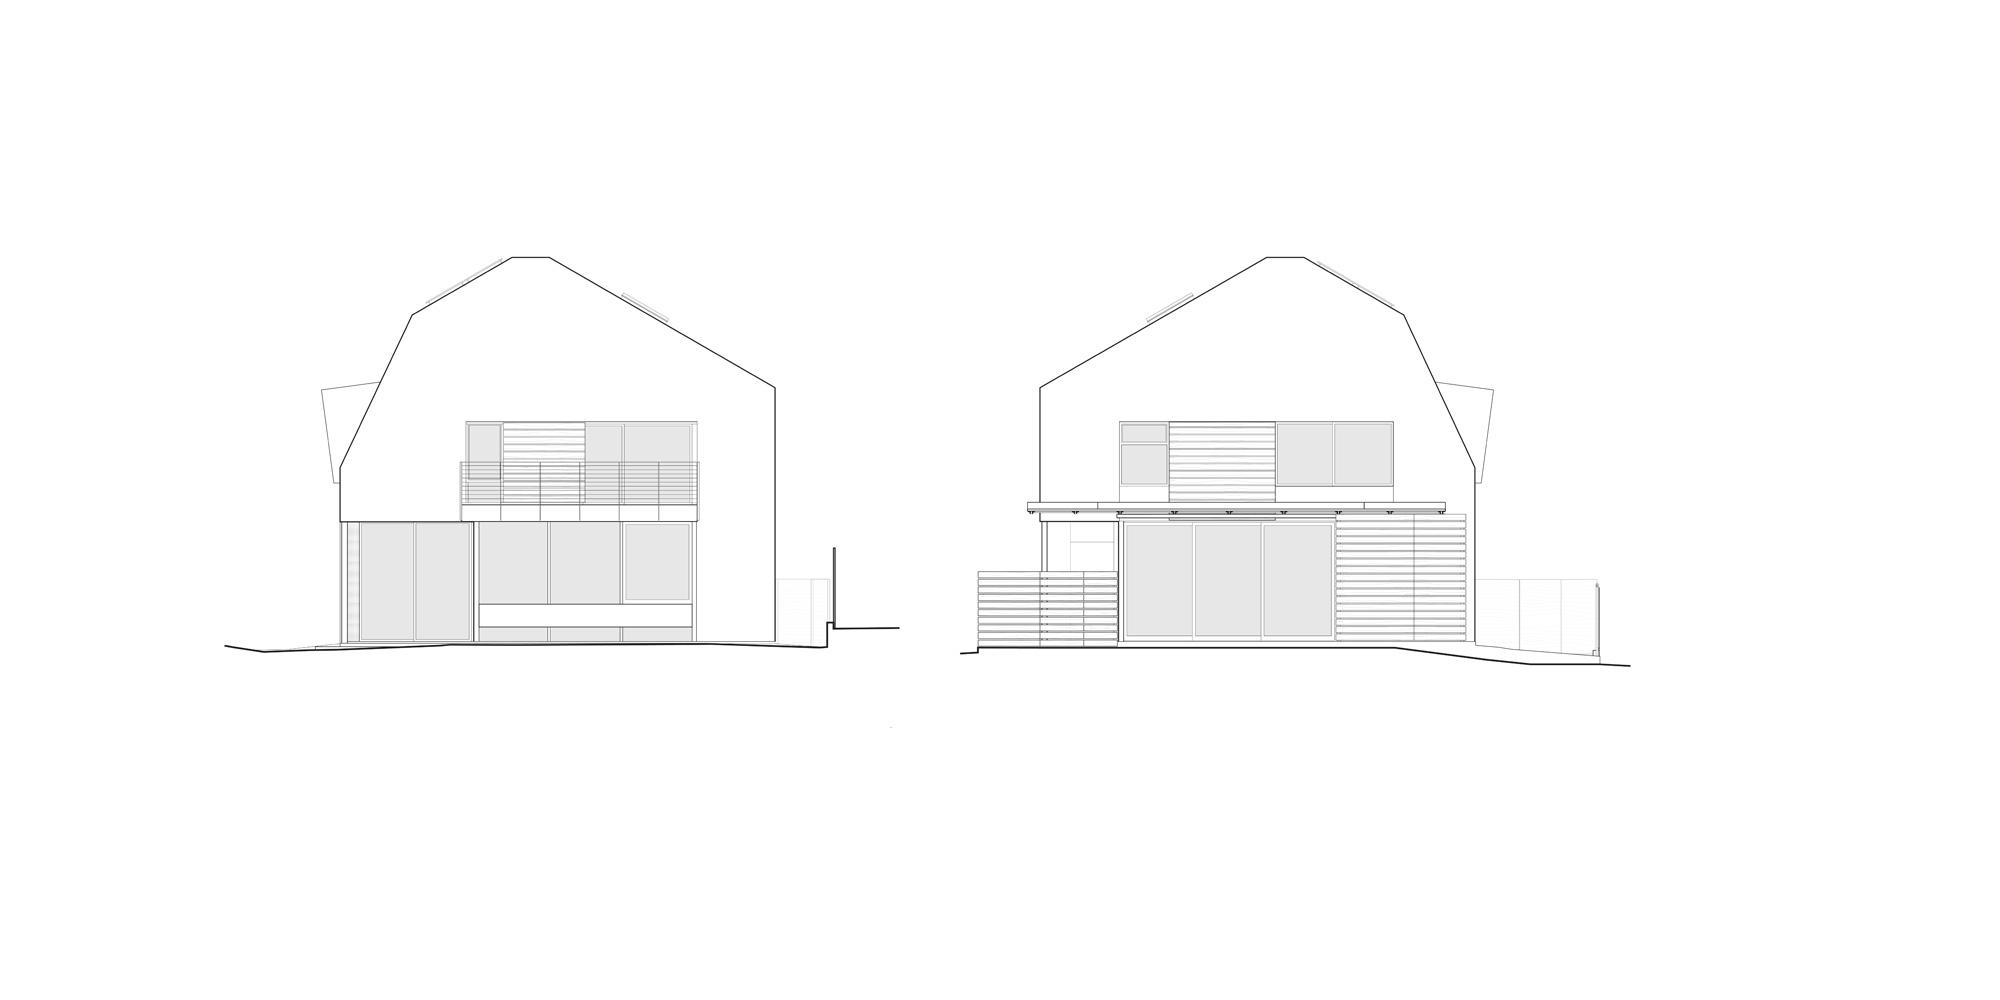 Prospetti Est e Ovest © Koning Eizenberg Architecture